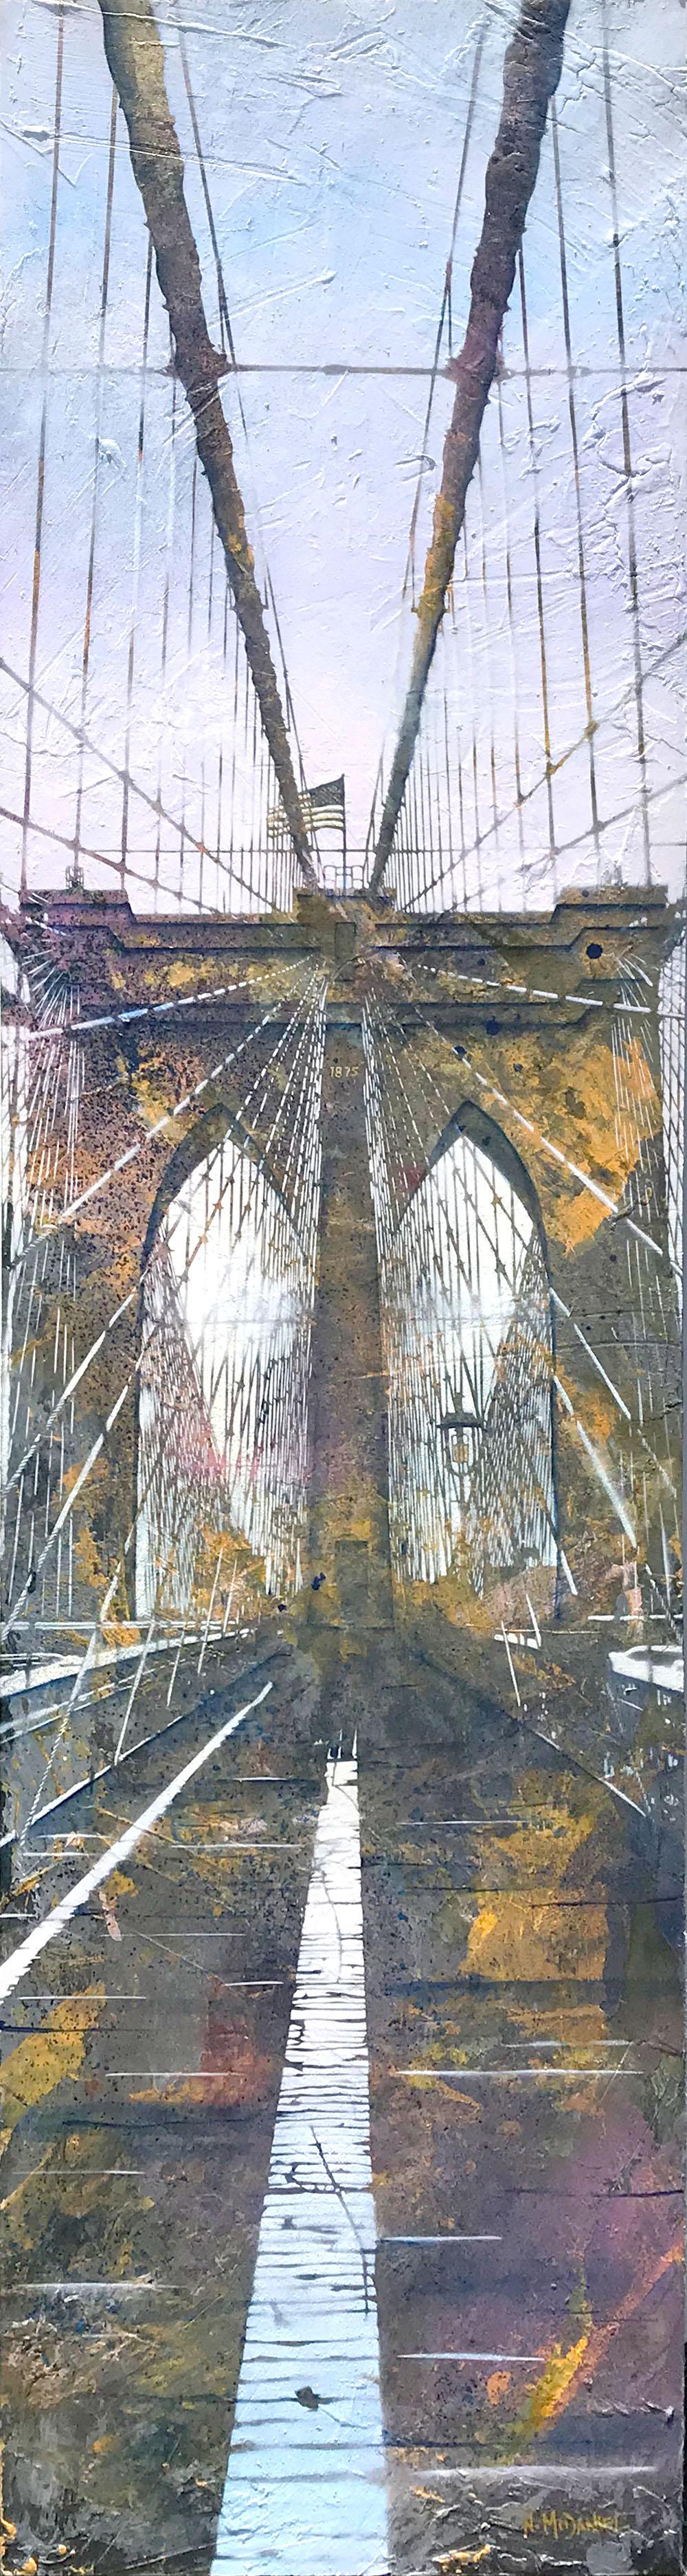 """Welcome to Brooklyn"" (Brooklyn Bridge, New York, New York) Original Painting By Artist Nichole McDaniel  75 x 20 Mixed Media (acrylic, aerosol, gold leaf, on wood panel)"